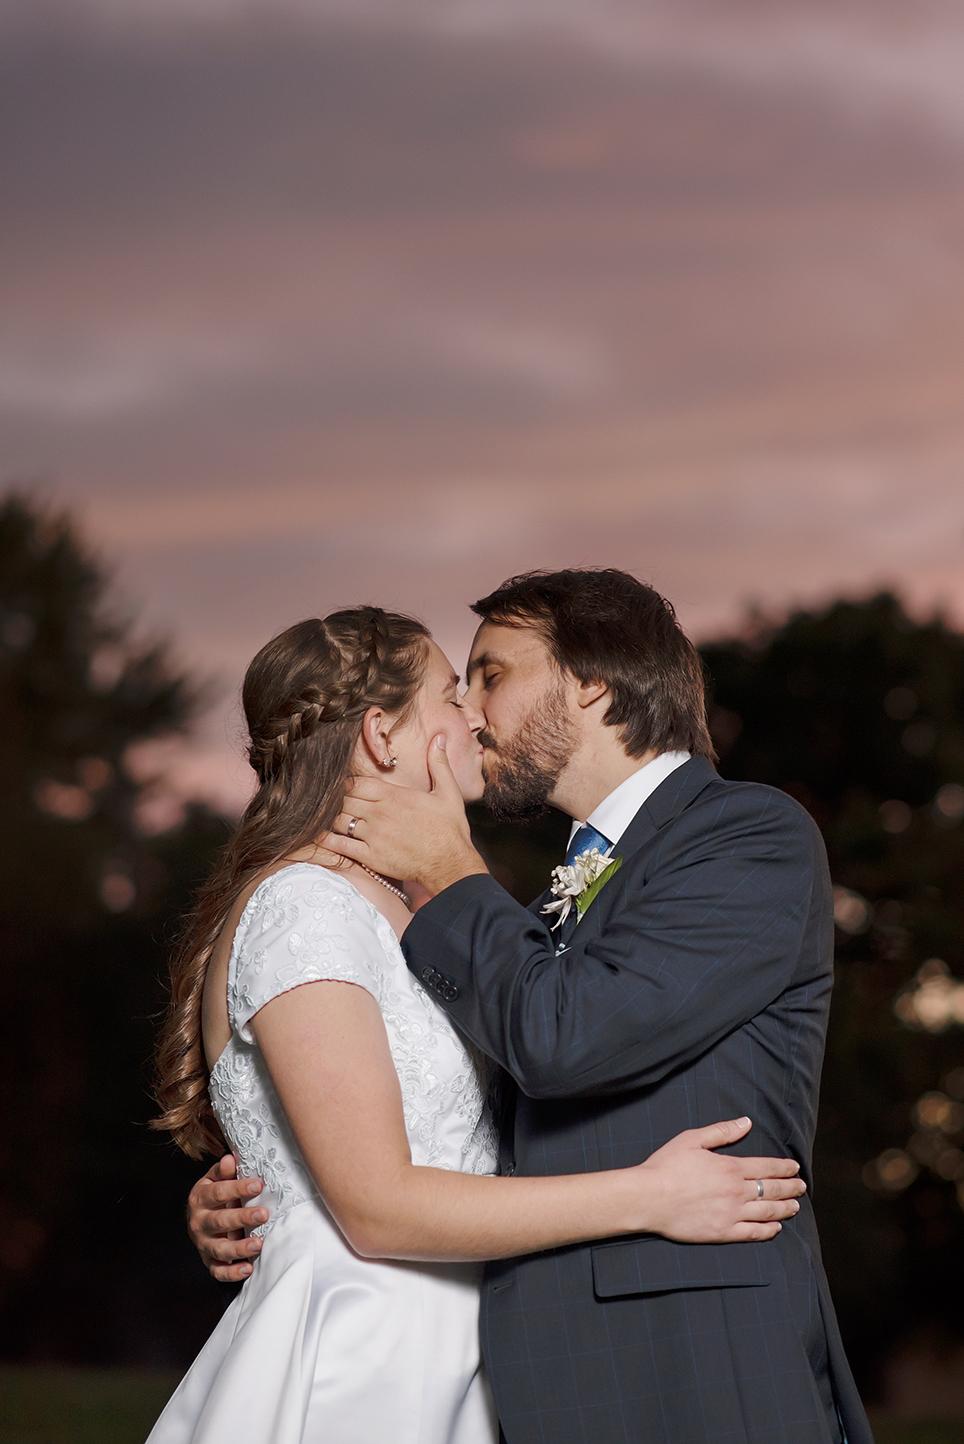 LINDSAY-ADKINS-PHOTOGRAPHY-MICHIGAN-WEDDING-PHOTOGRAPHER-ADRIAN-COLLEGE-WEDDING